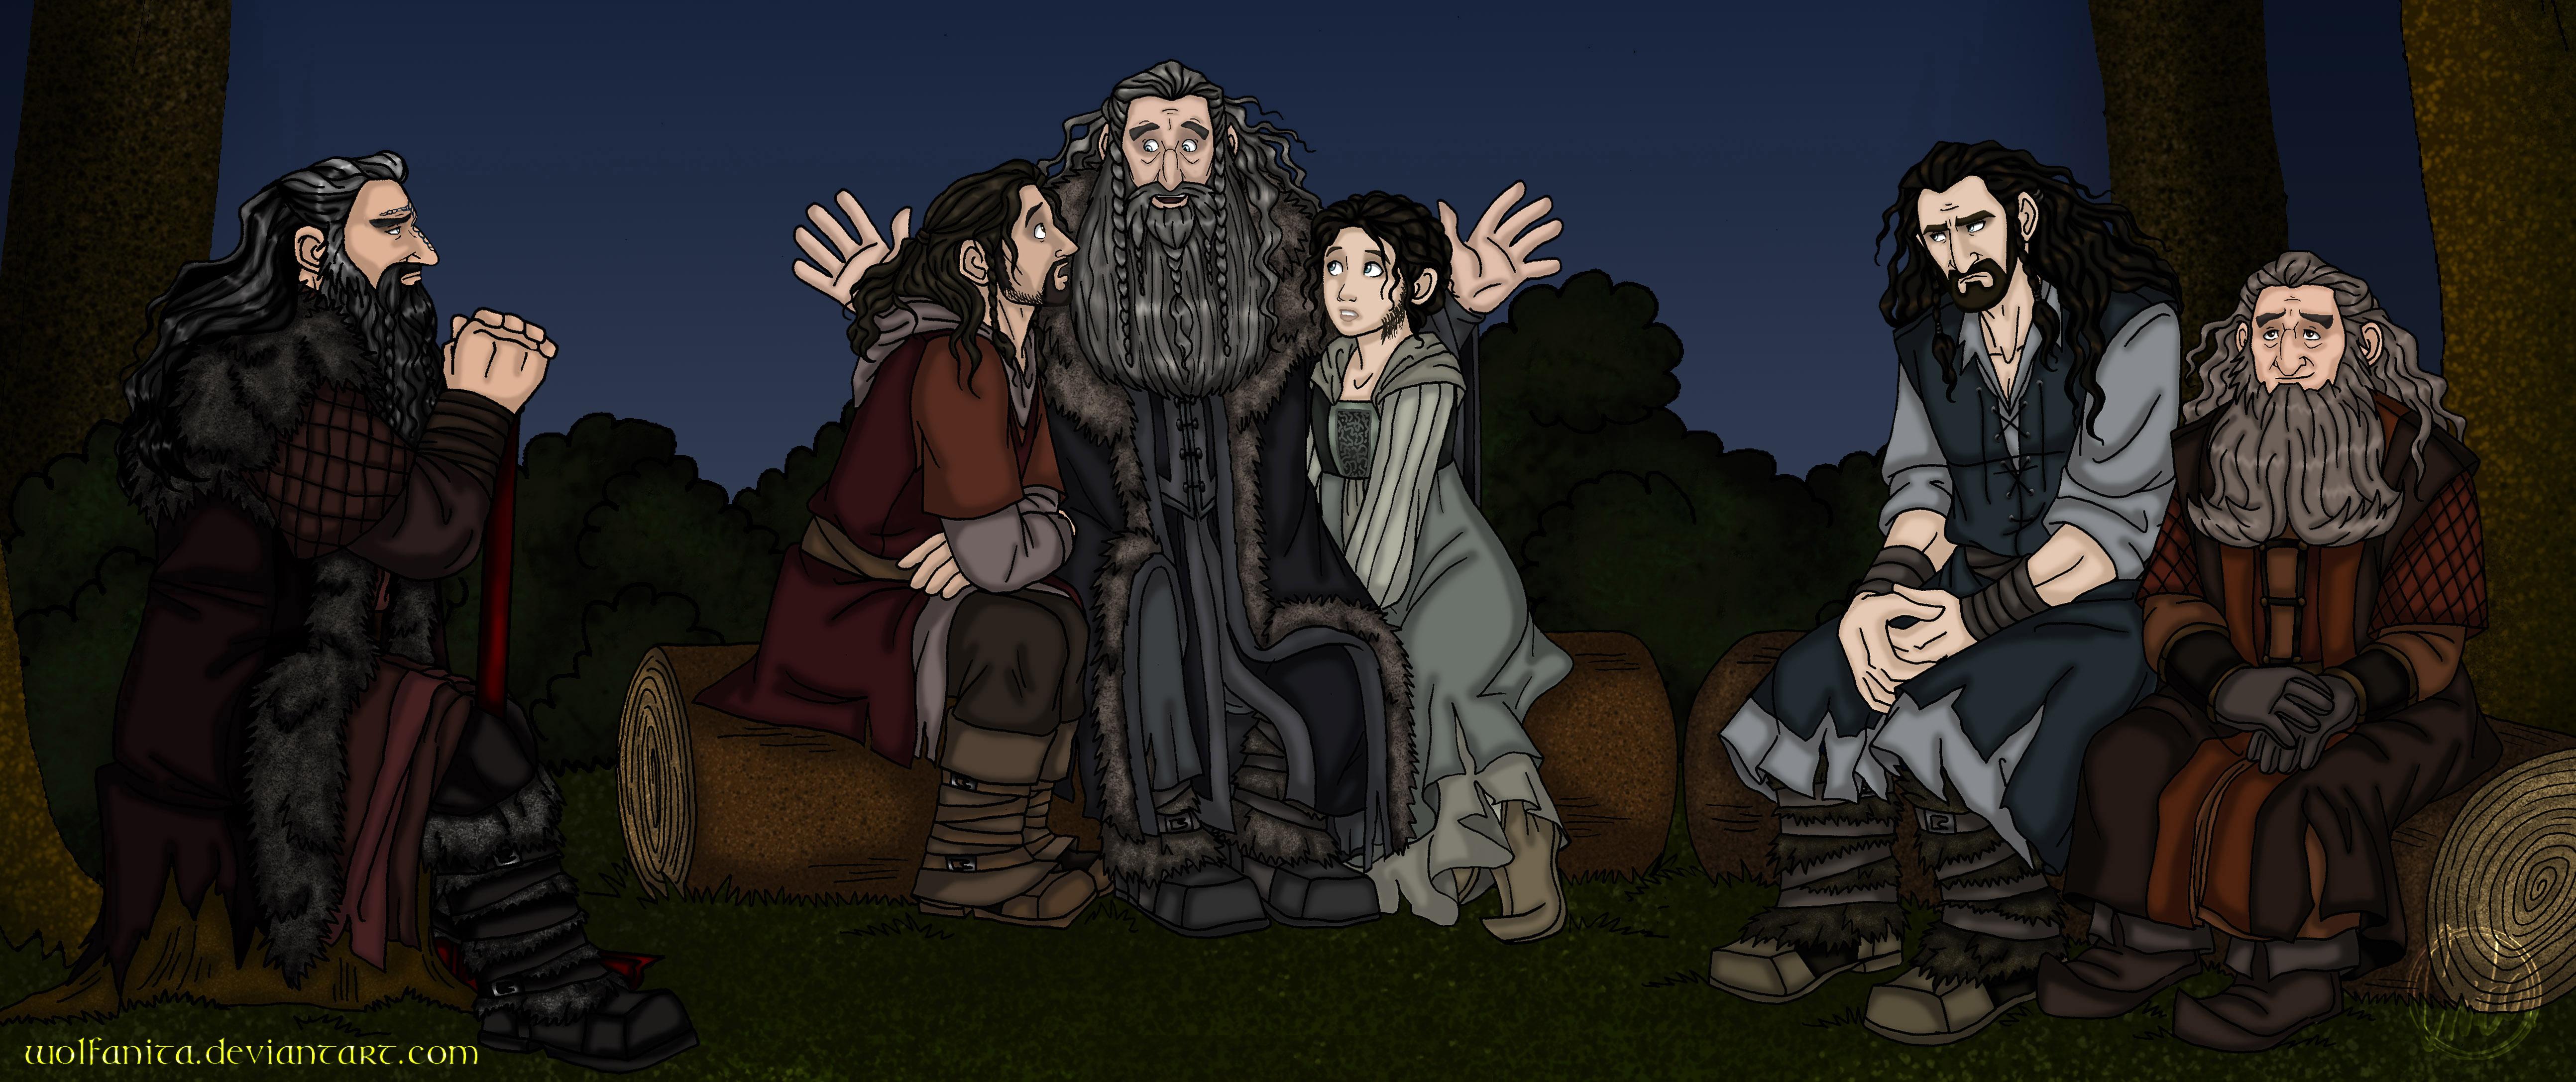 The Hobbit I Dreamt of Erebor Unlighted CloseUp by wolfanita on 5175x2174